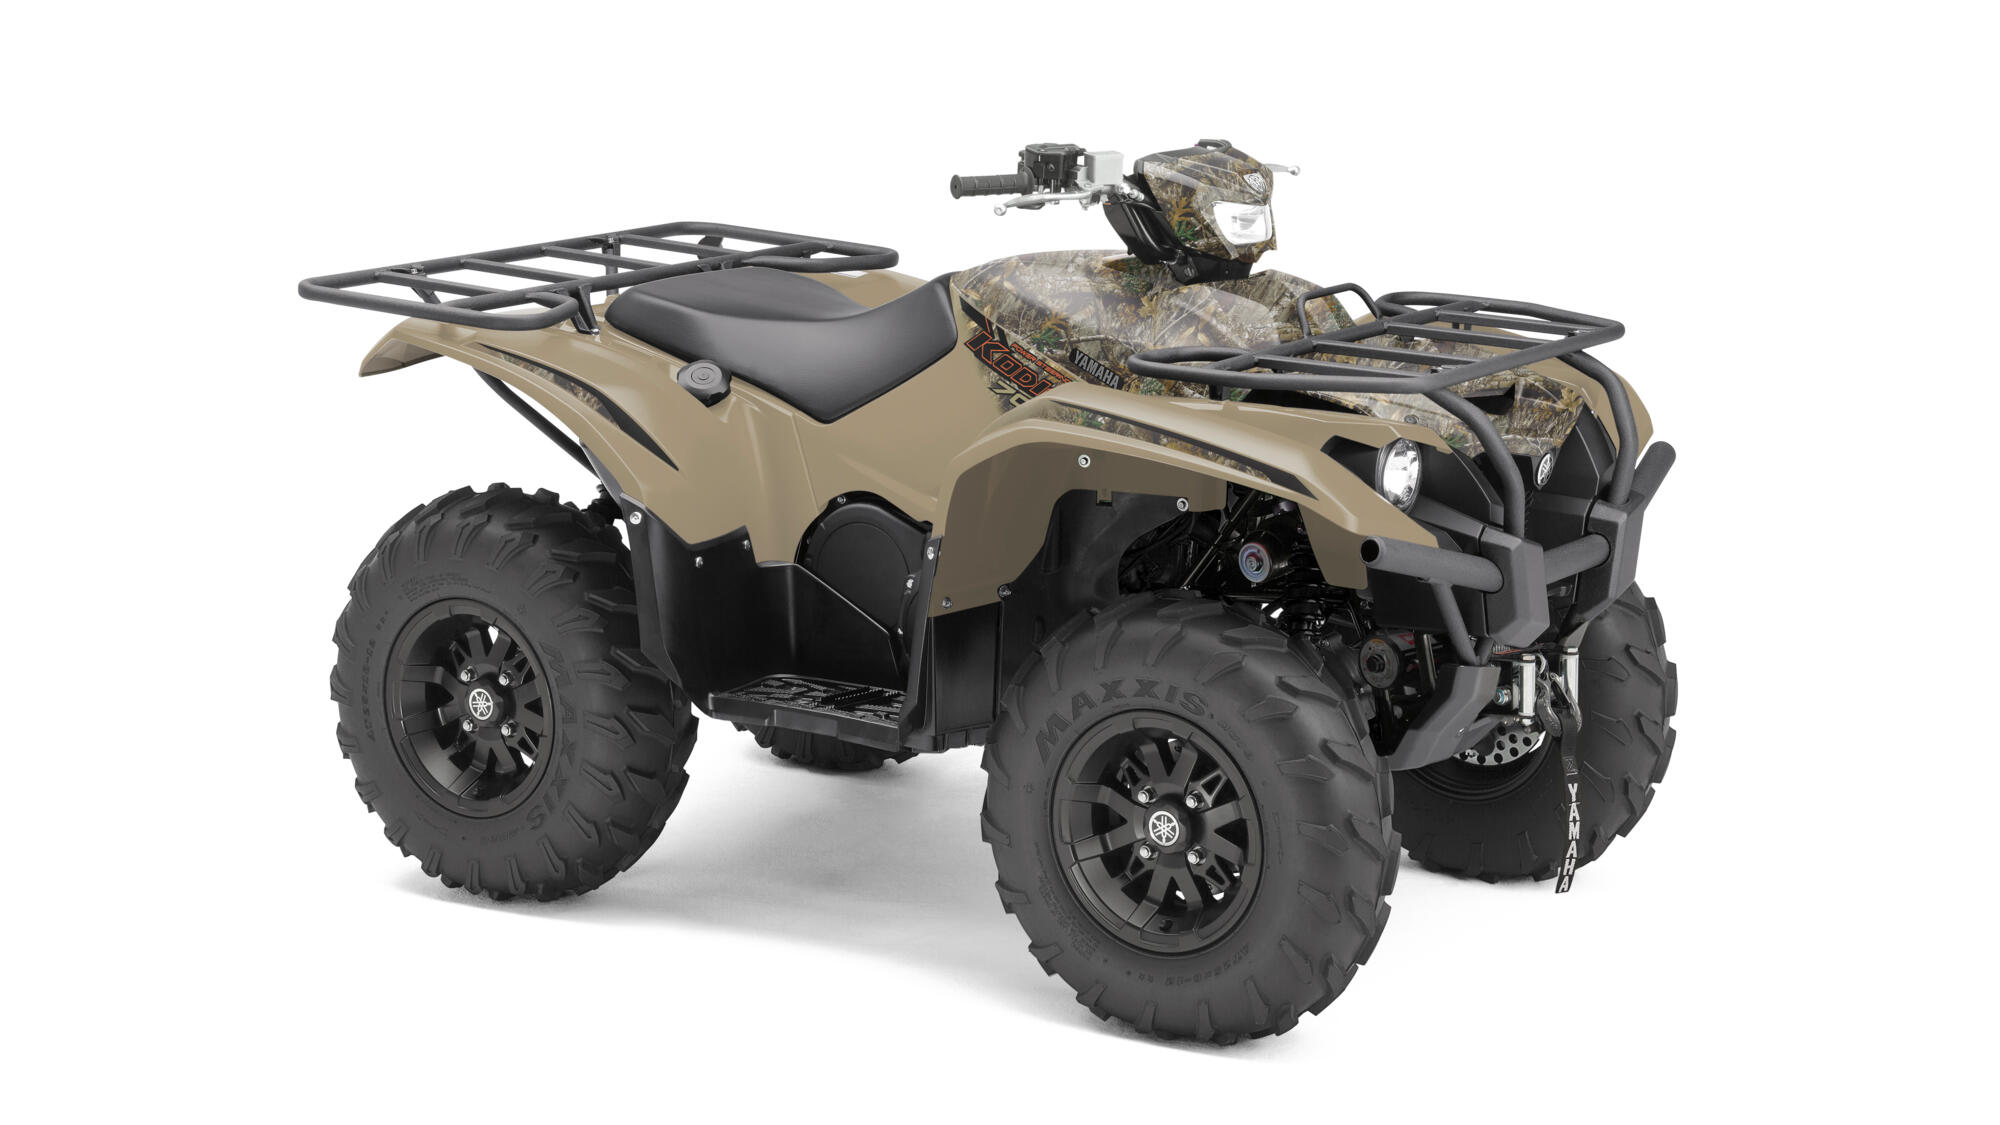 Yamaha Kodiak 700 | MotorCentrumWest